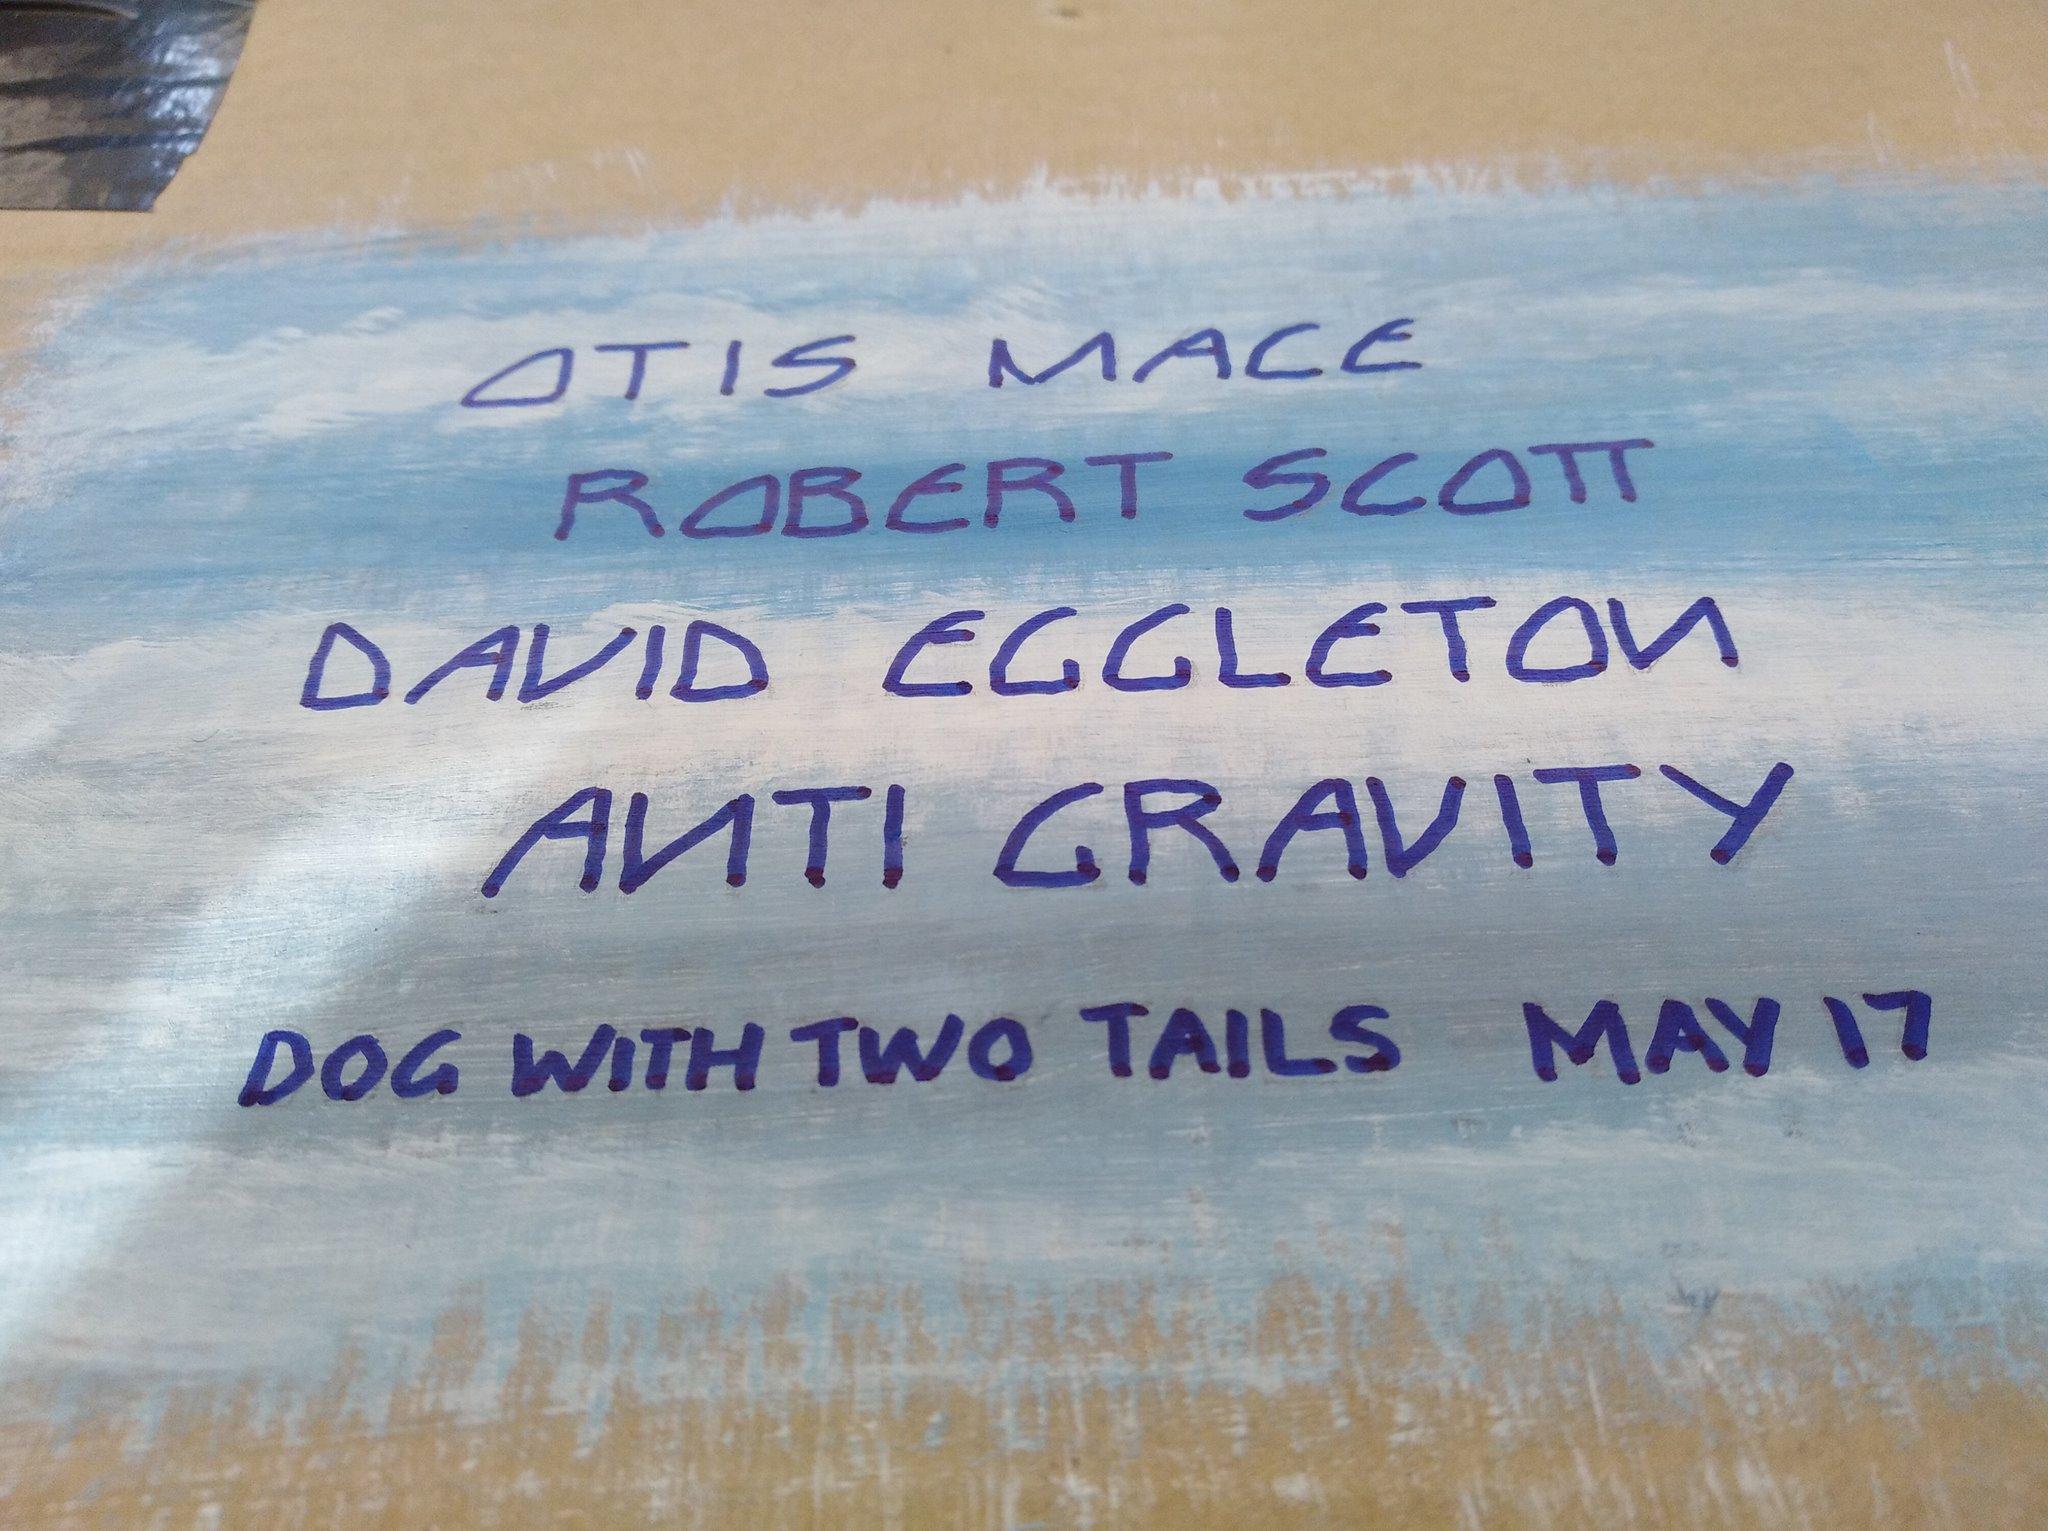 Otis Mace, Robert Scott, David Eggleton.